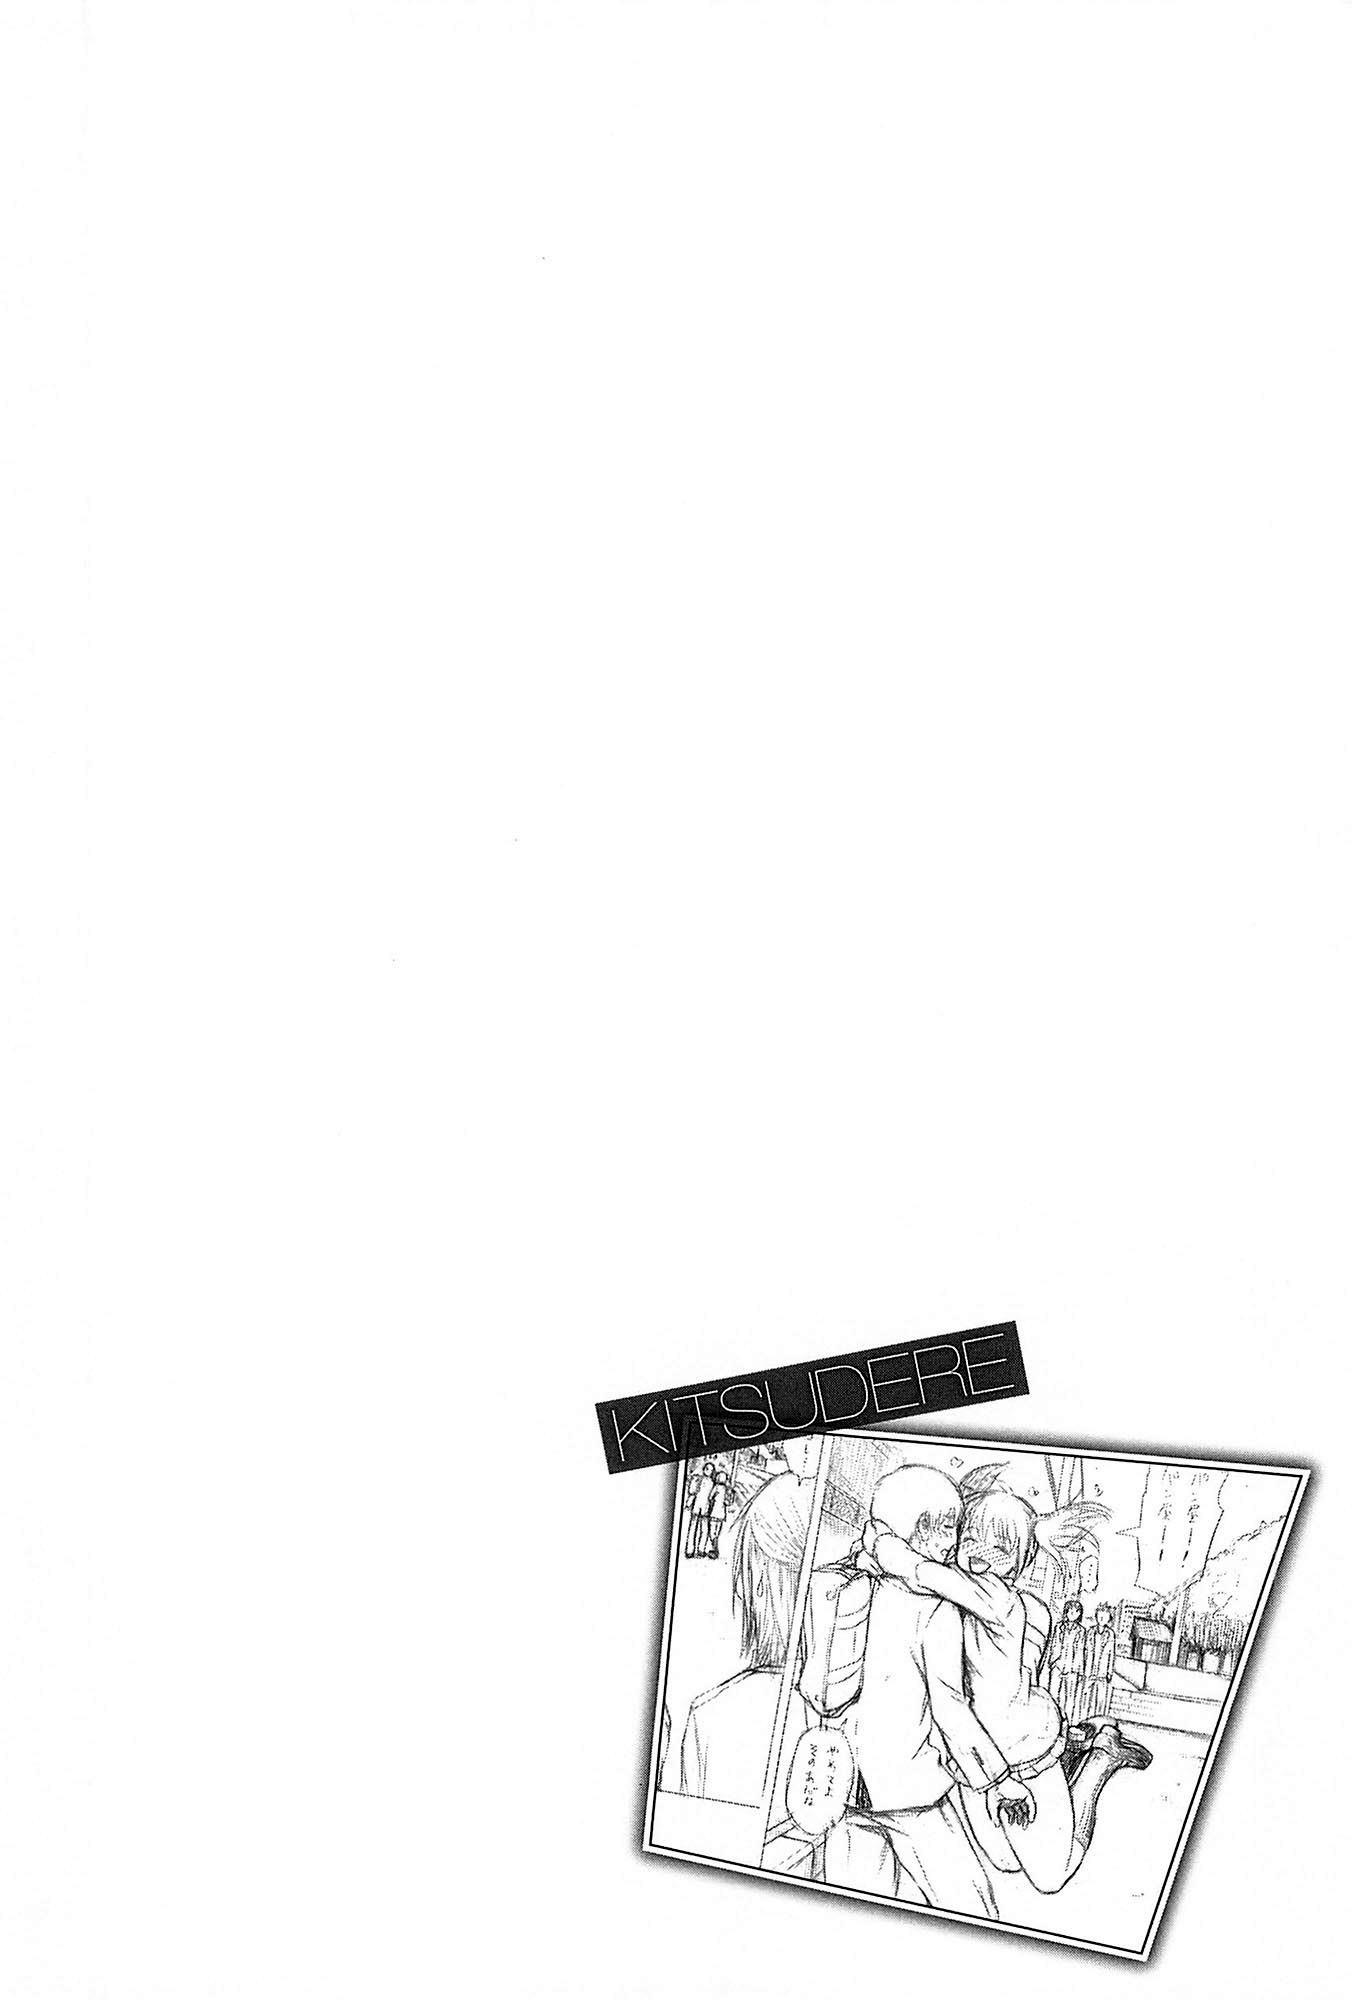 HentaiVN.net - Ảnh 19 - Kitsudere - Chap 2